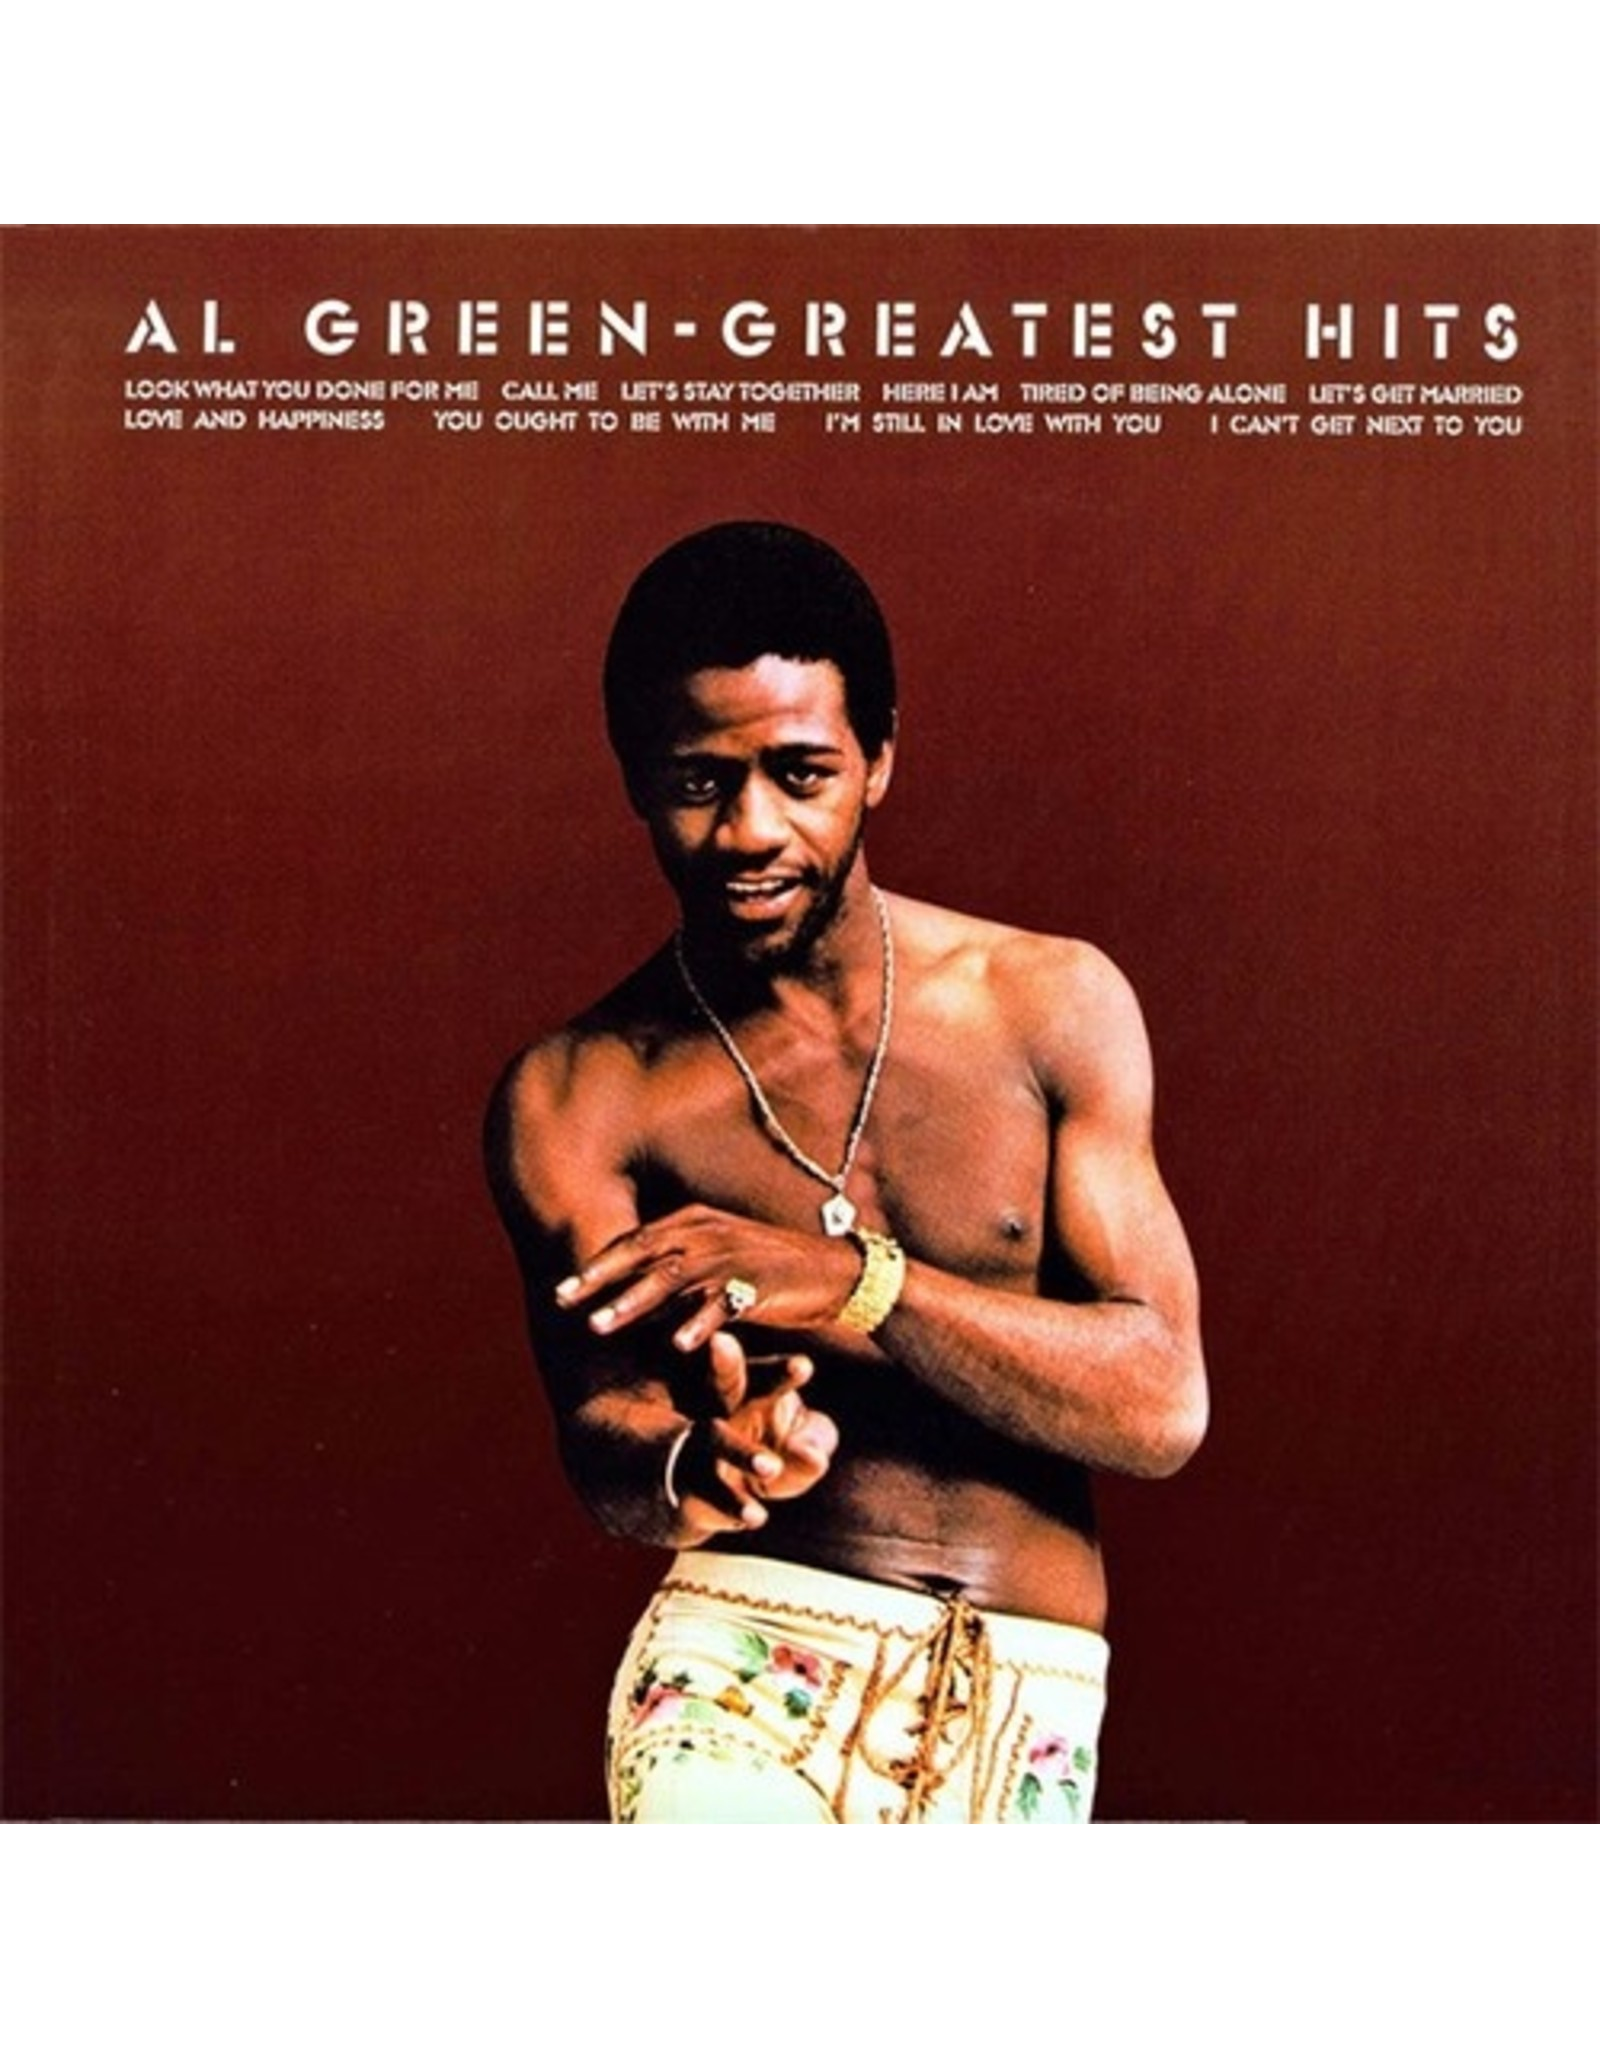 New Vinyl Al Green - Greatest Hits LP